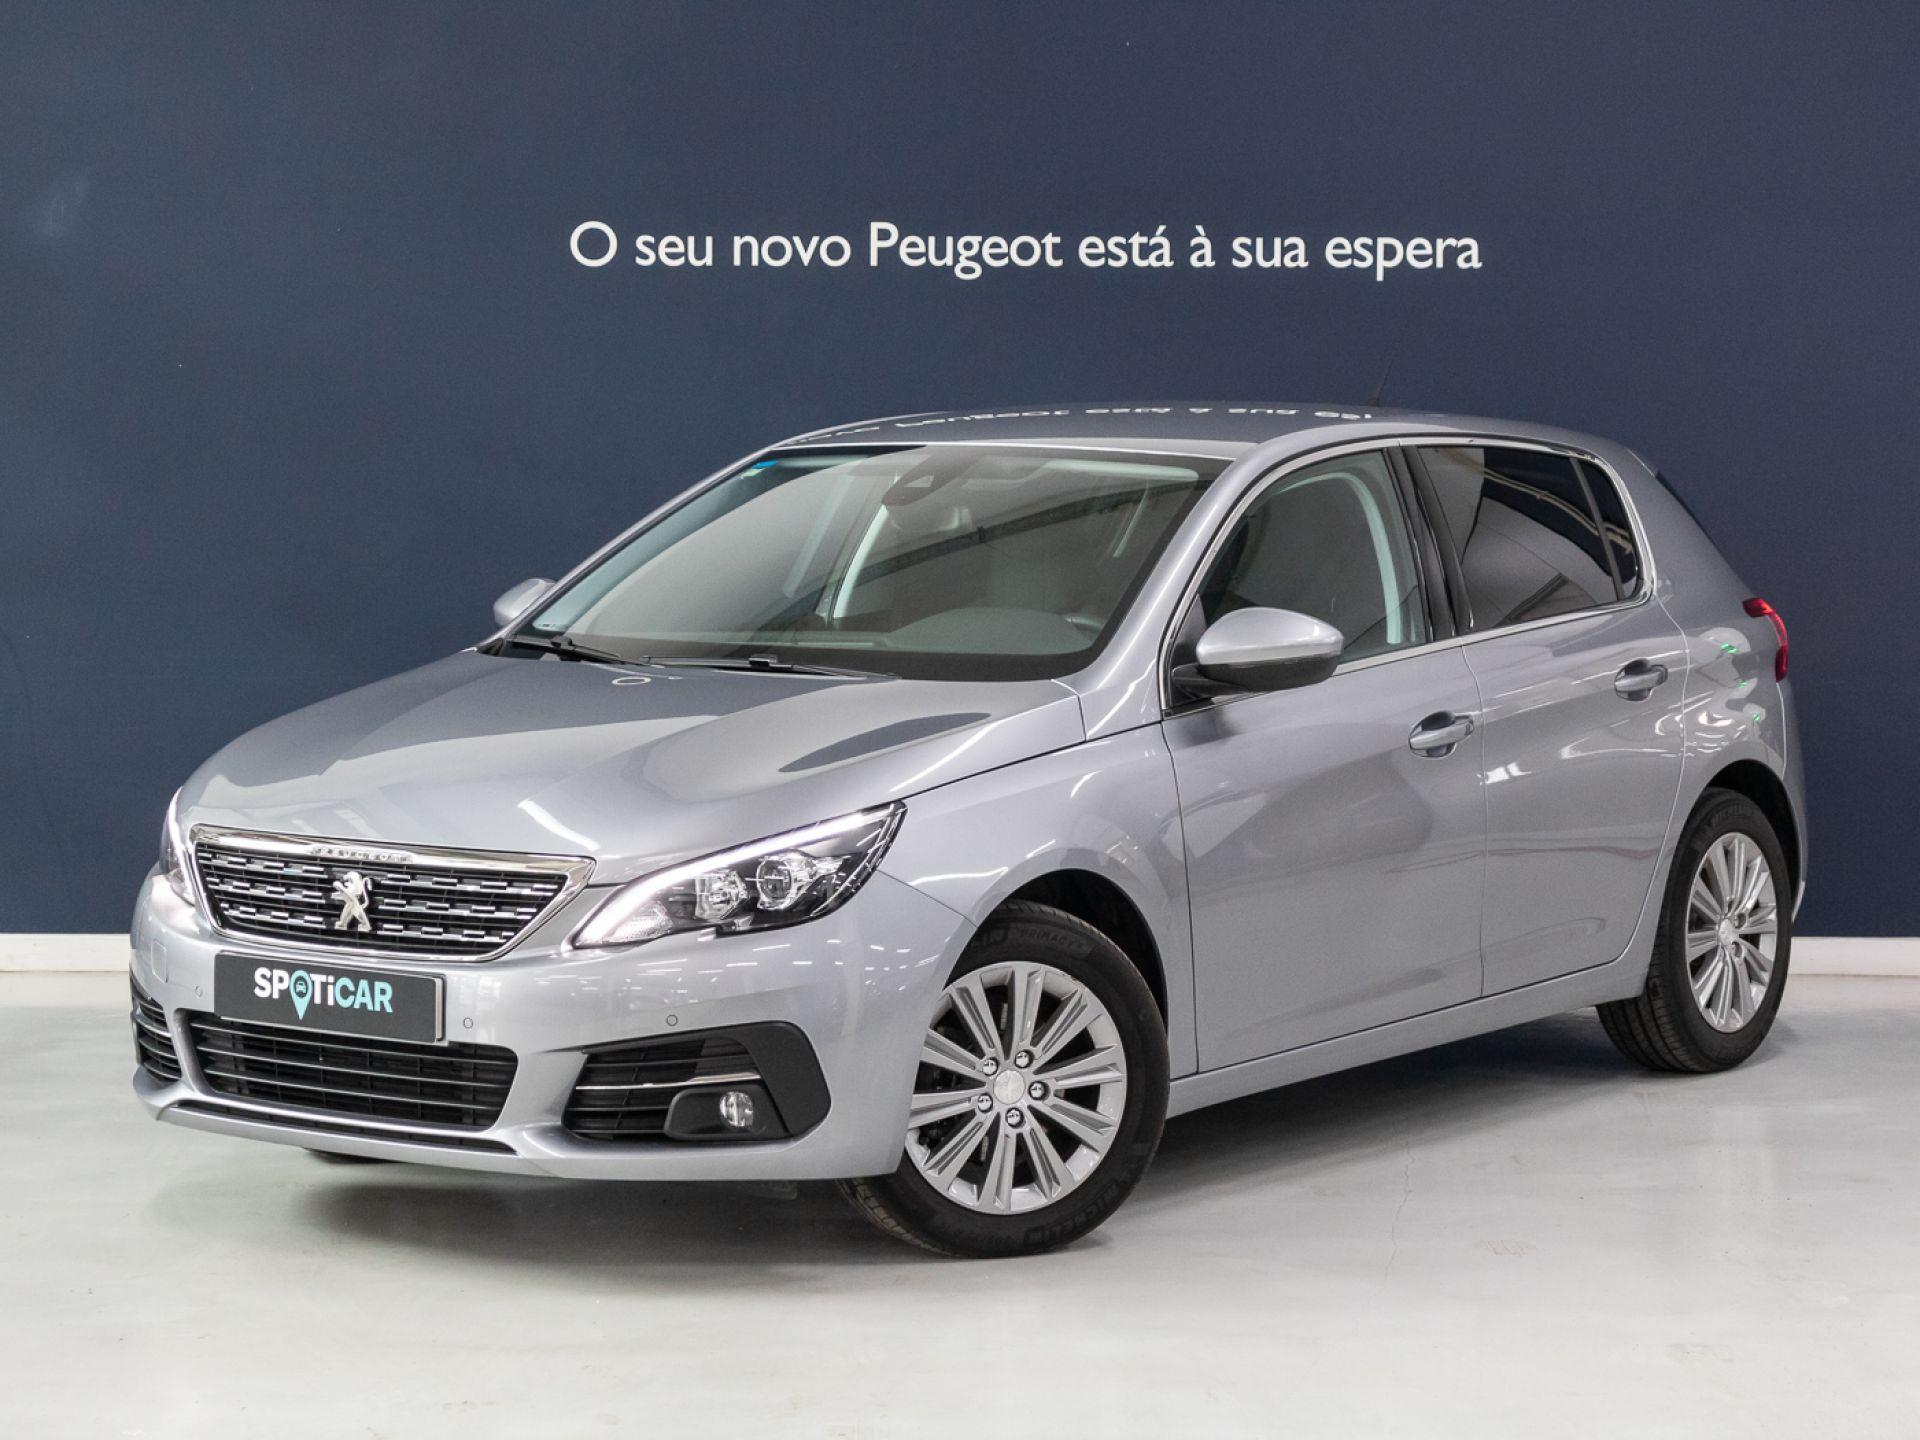 Peugeot 308 Allure 1.5 BlueHDi 130 cv segunda mão Setúbal